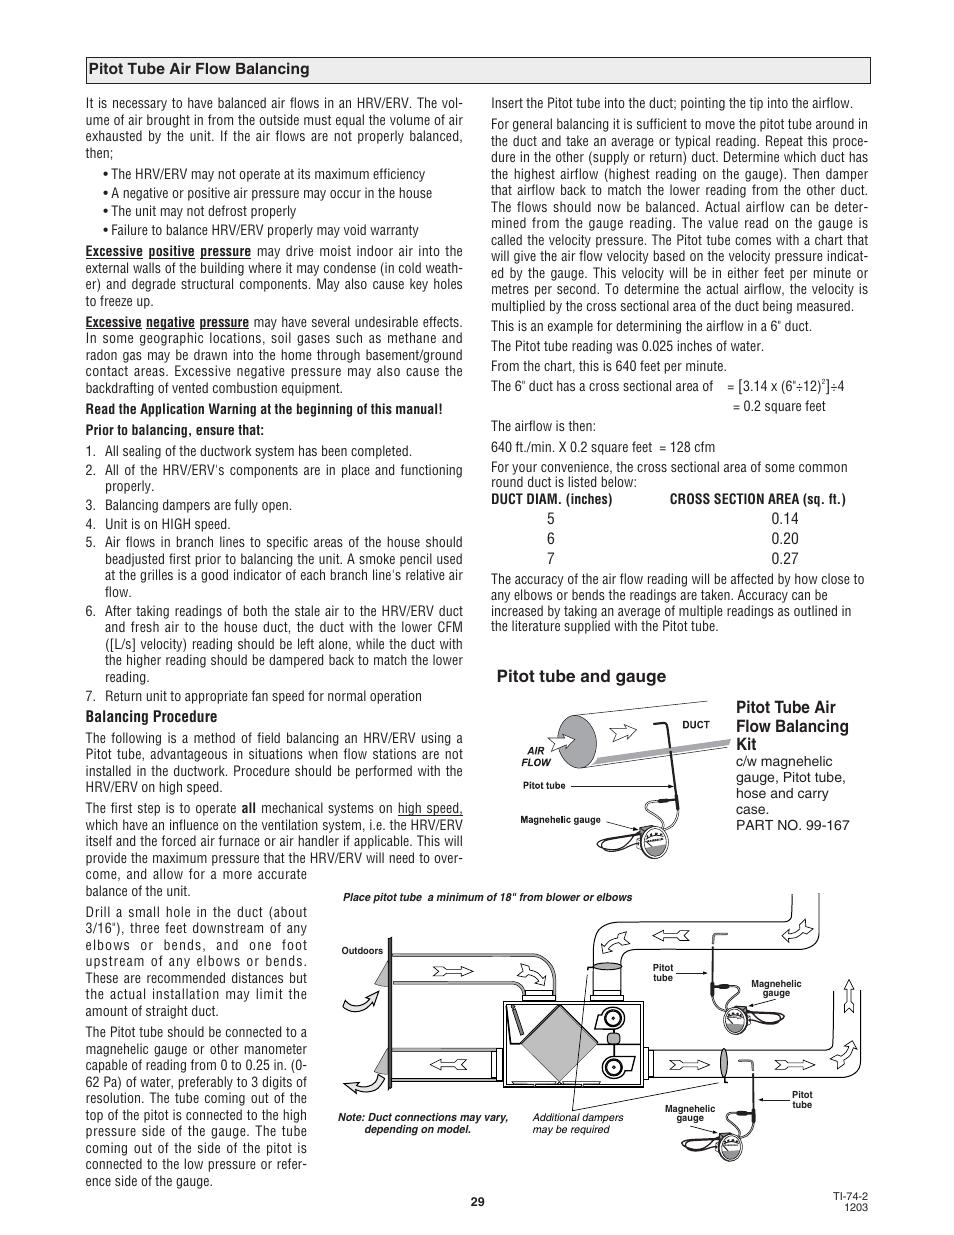 Pitot Tube And Gauge Pitot Tube Air Flow Balancing Kit Lifebreath